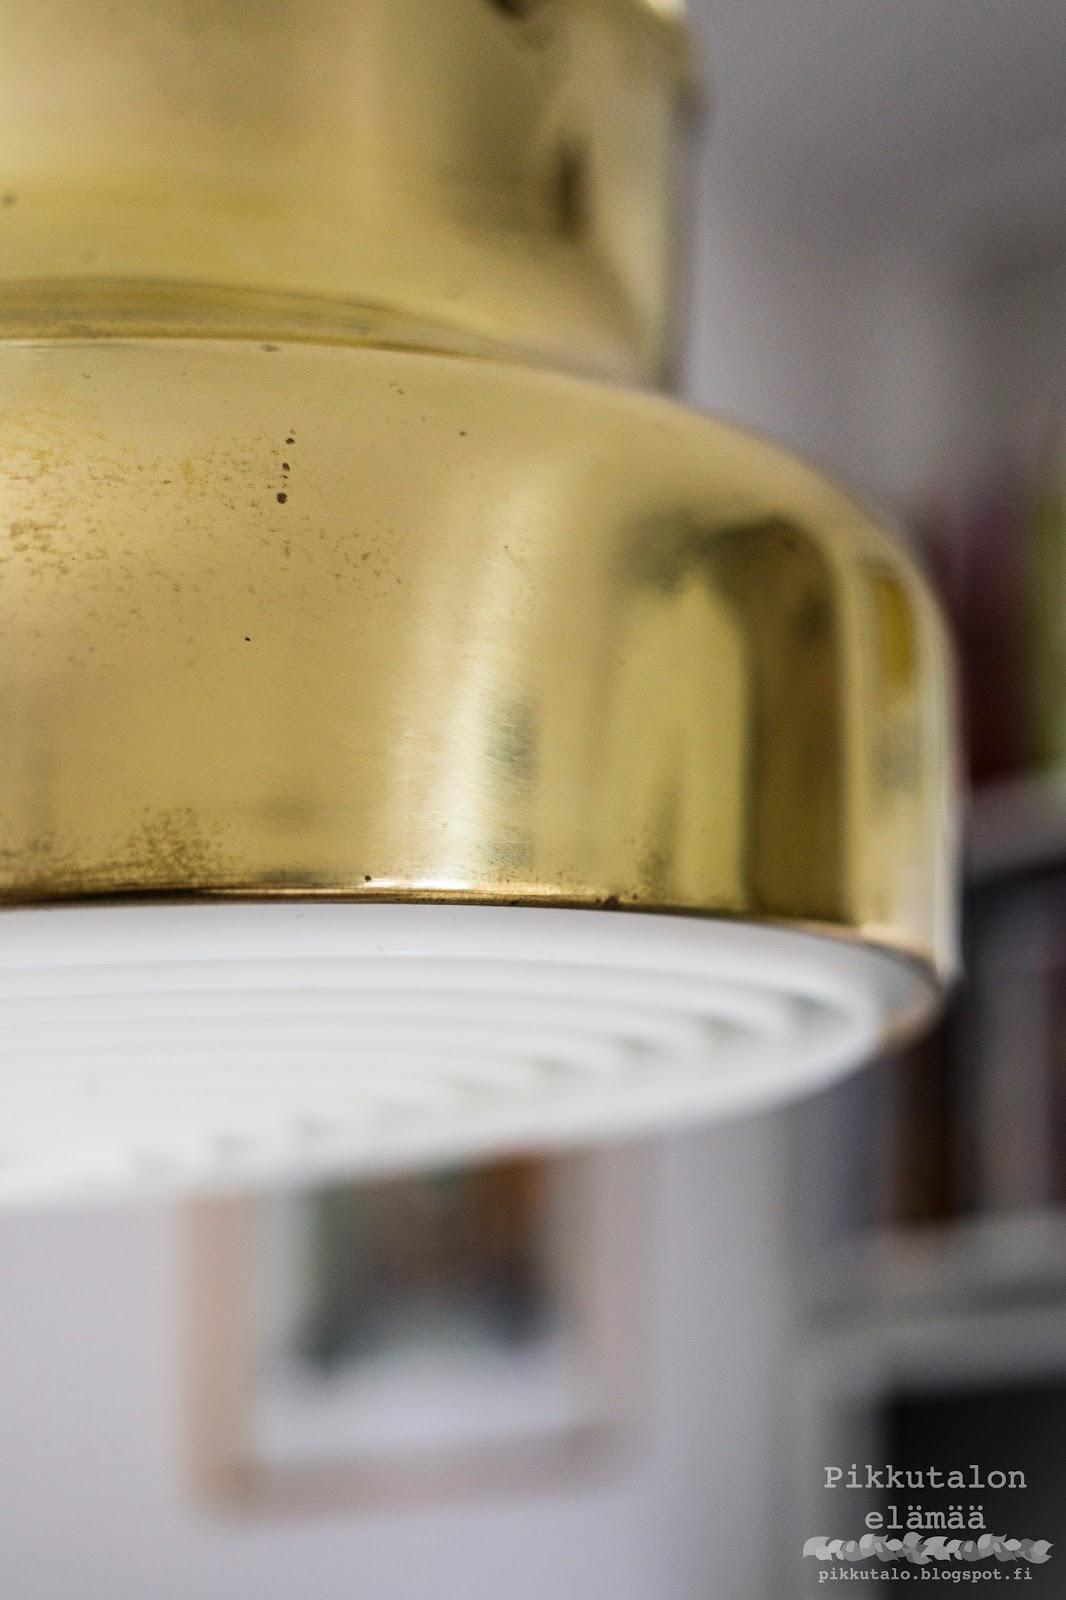 Bumling lampa